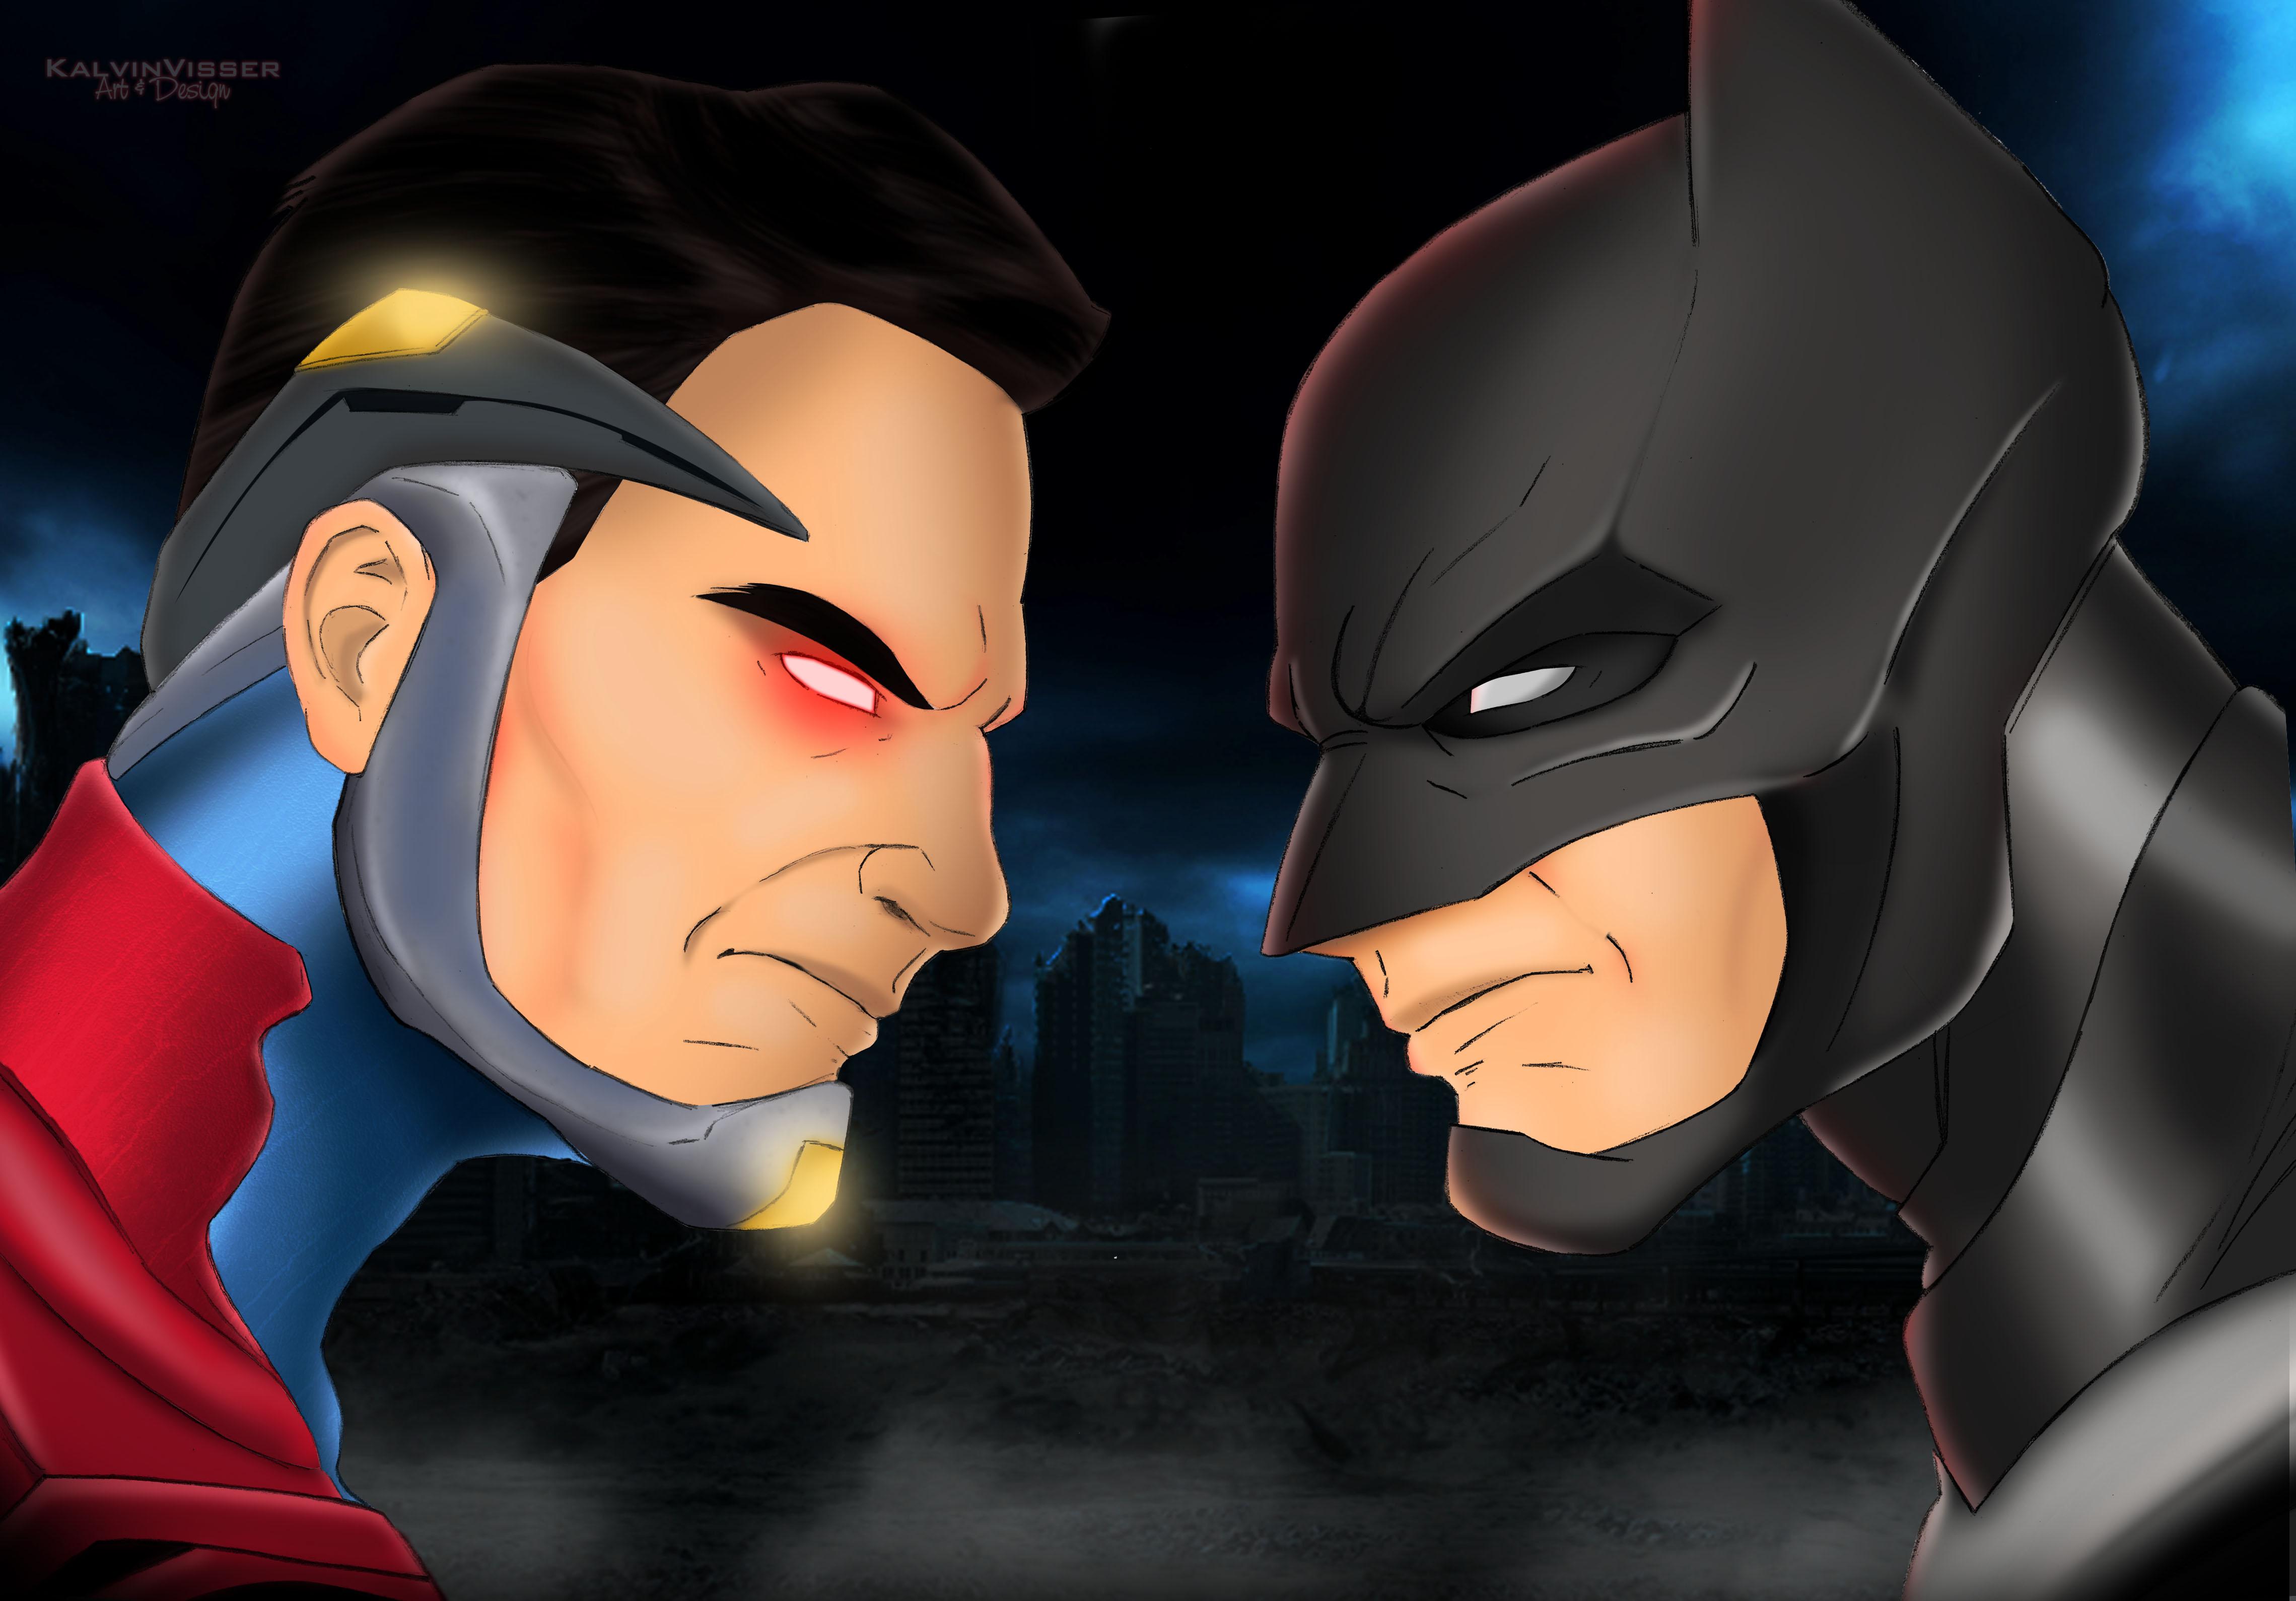 Injustice 2 Superman Hd Games 4k Wallpapers Images: Injustice 2 Superman Vs Batman Art, HD Superheroes, 4k